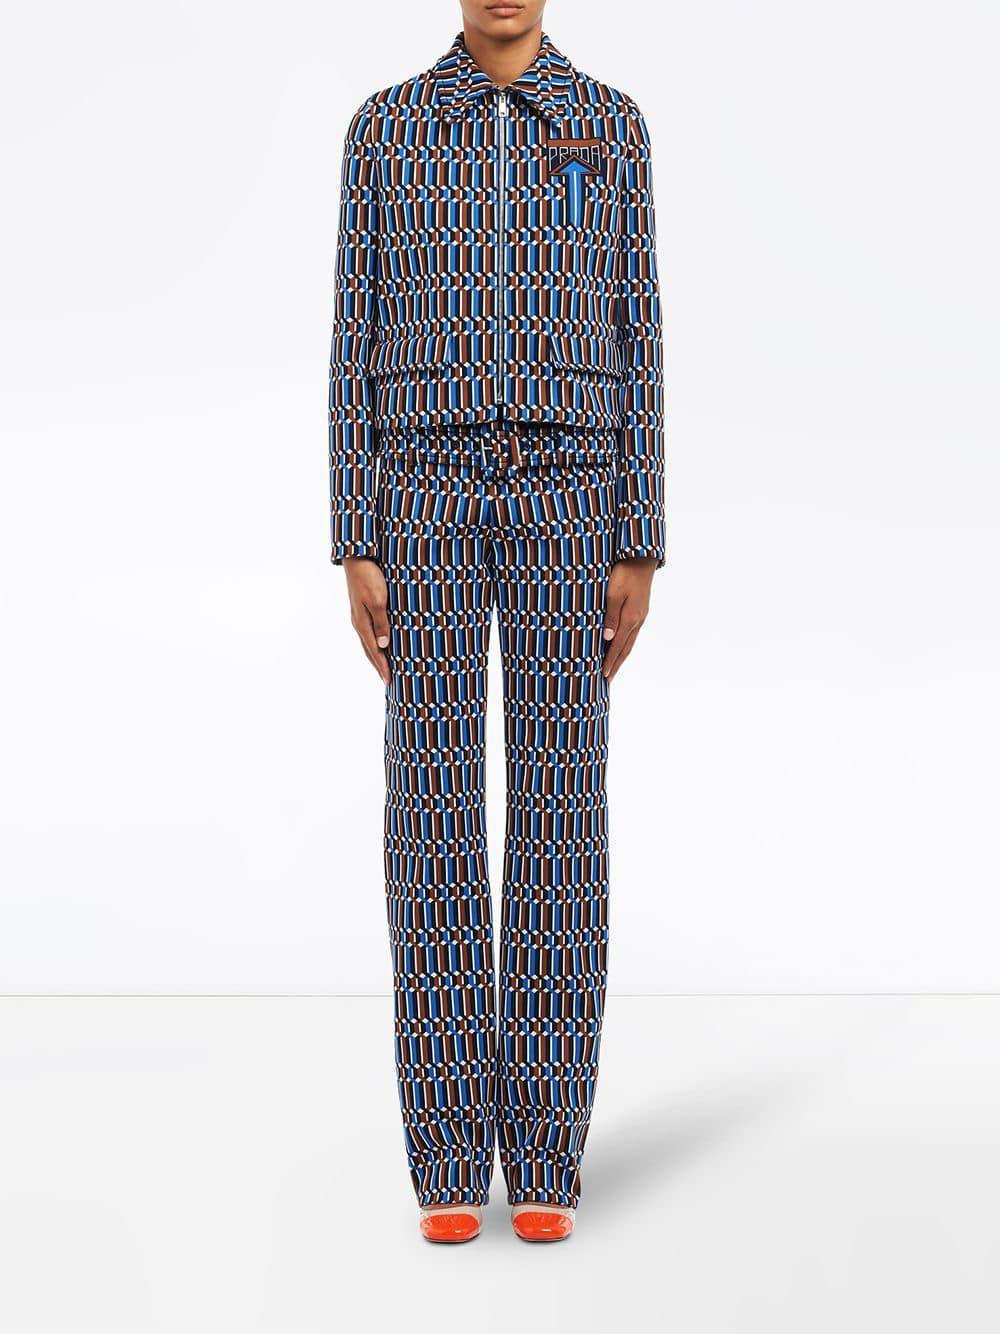 61f03a556 Lyst - Prada Geometric Jacquard Jacket in Blue